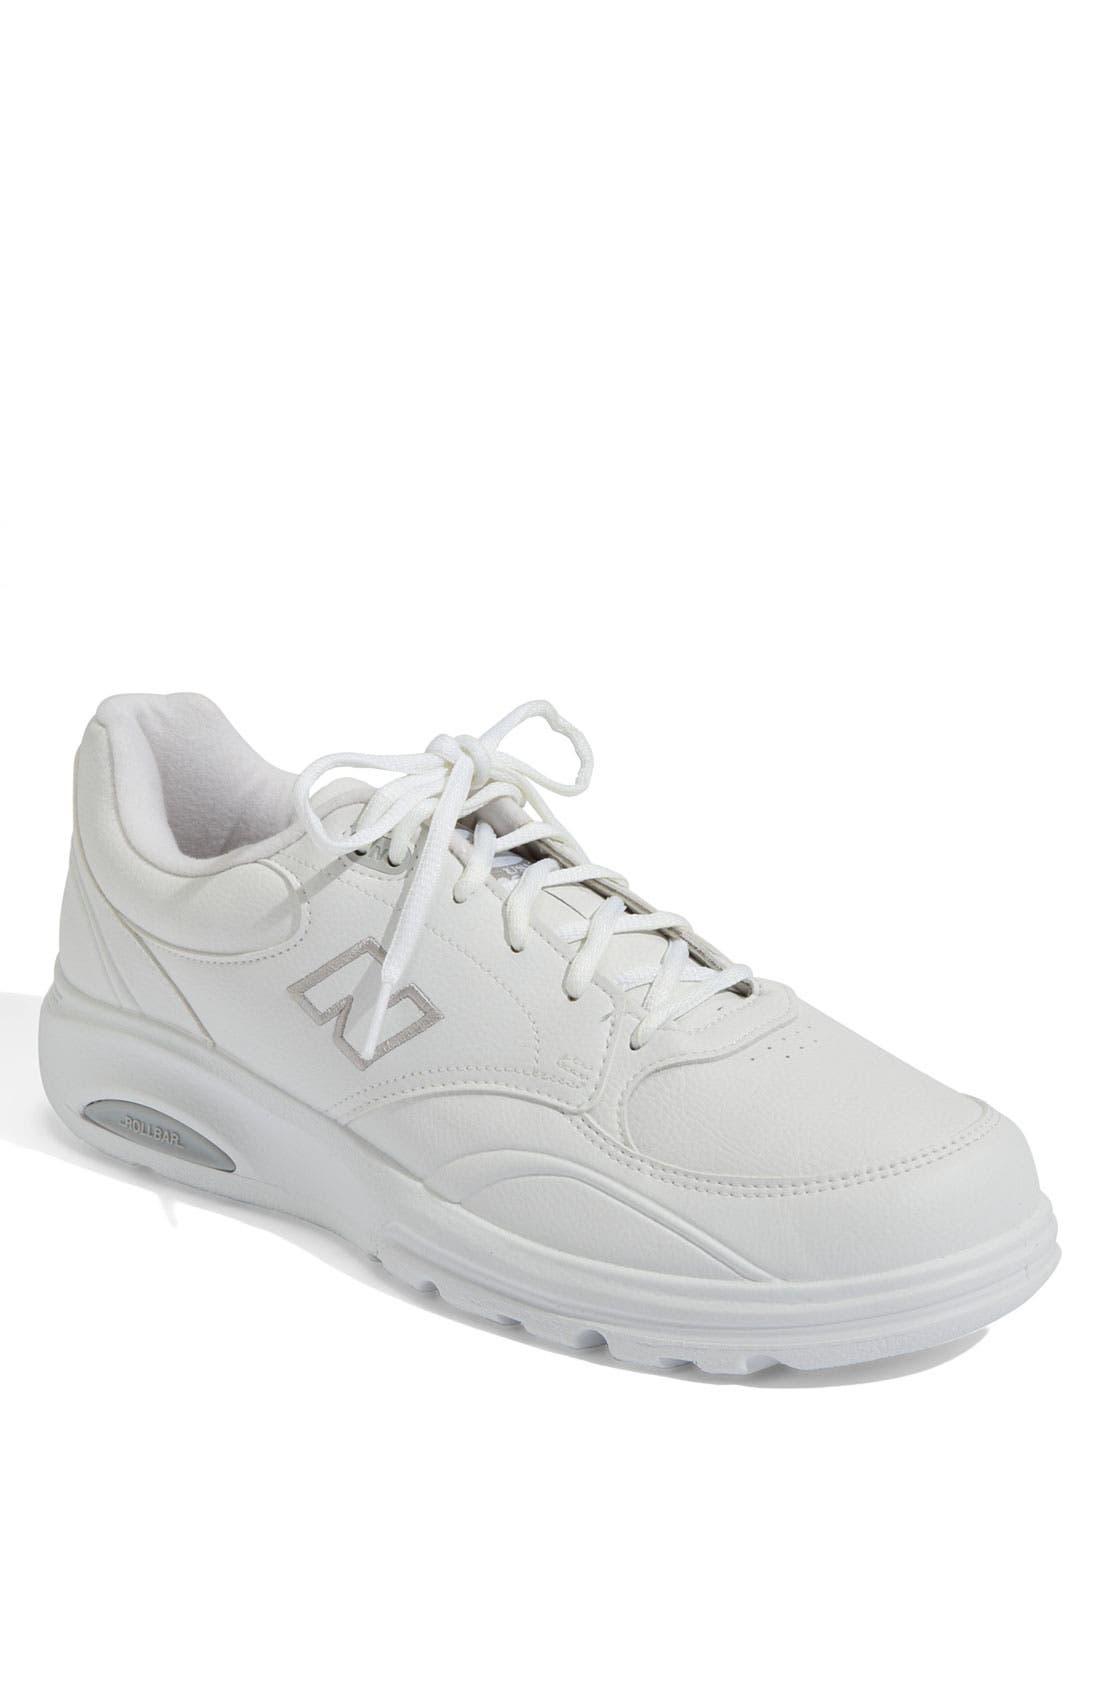 new balance 812 walking shoes